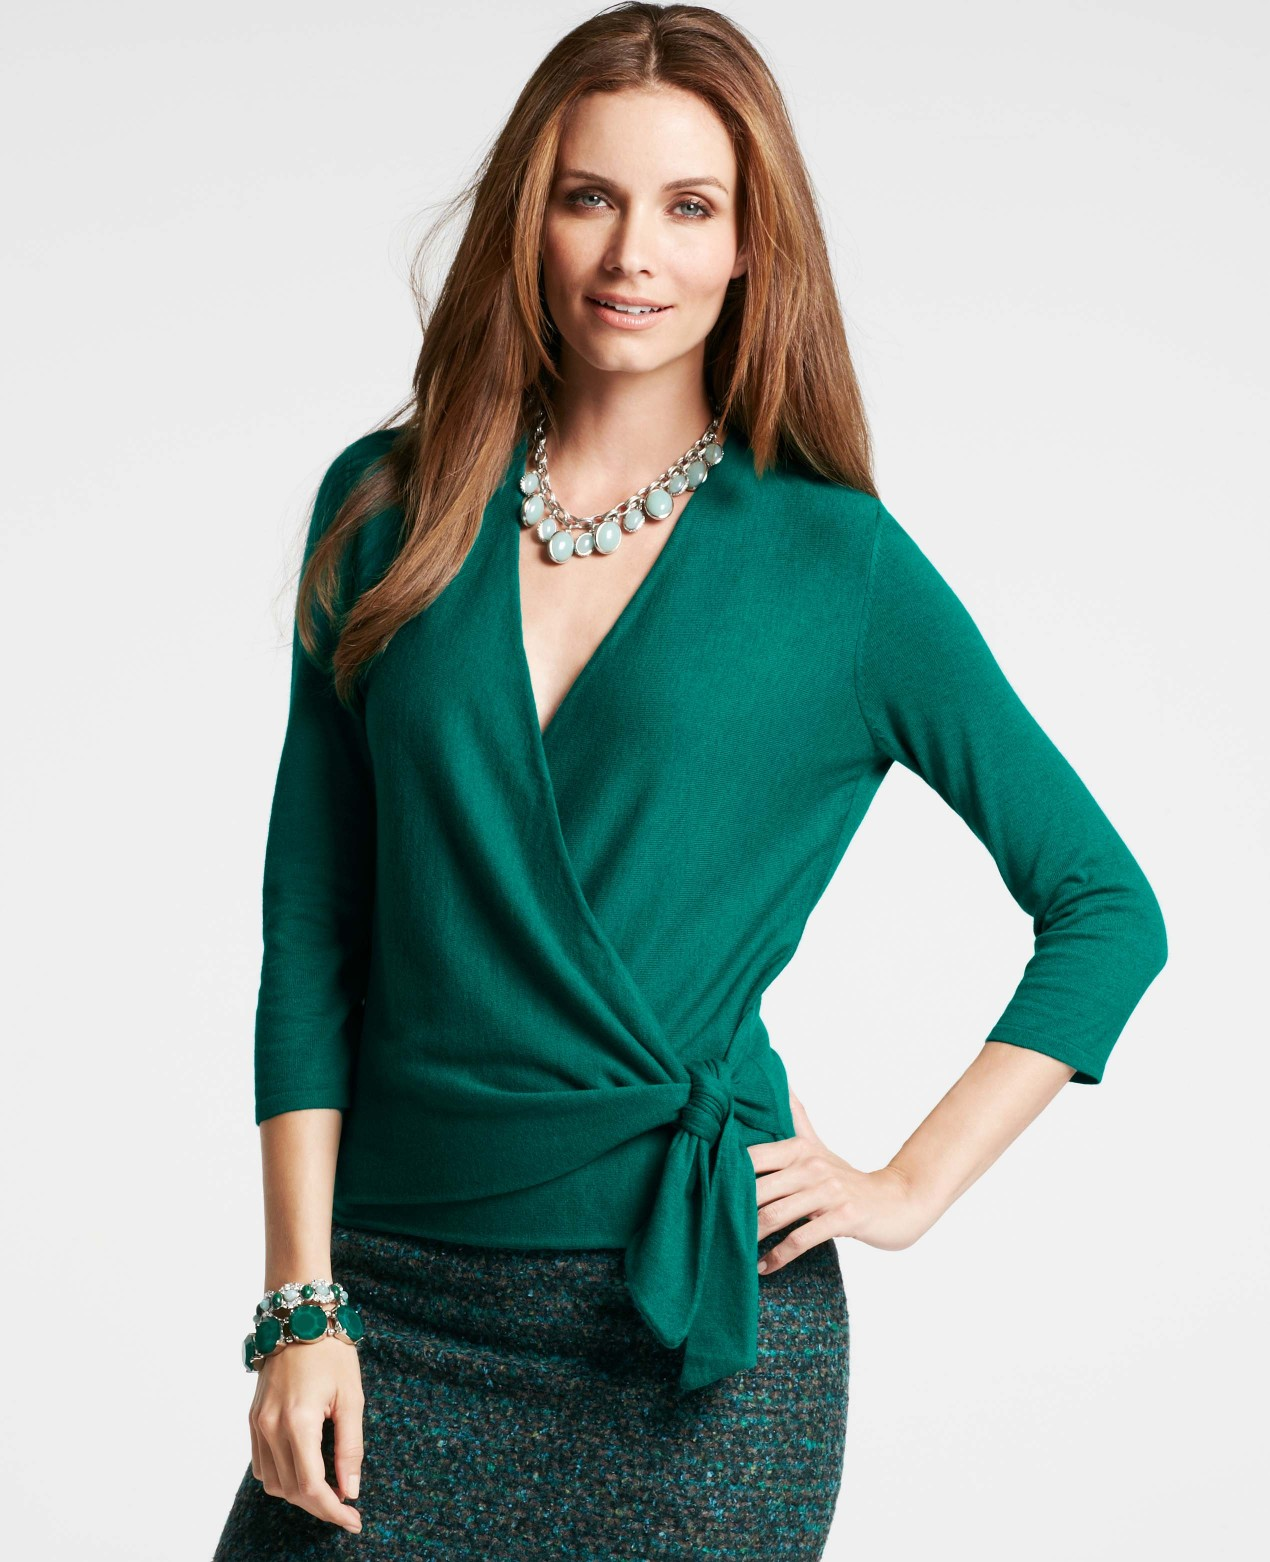 830badb65f6 Ann Taylor 34 Sleeve Wrap Sweater in Green - Lyst